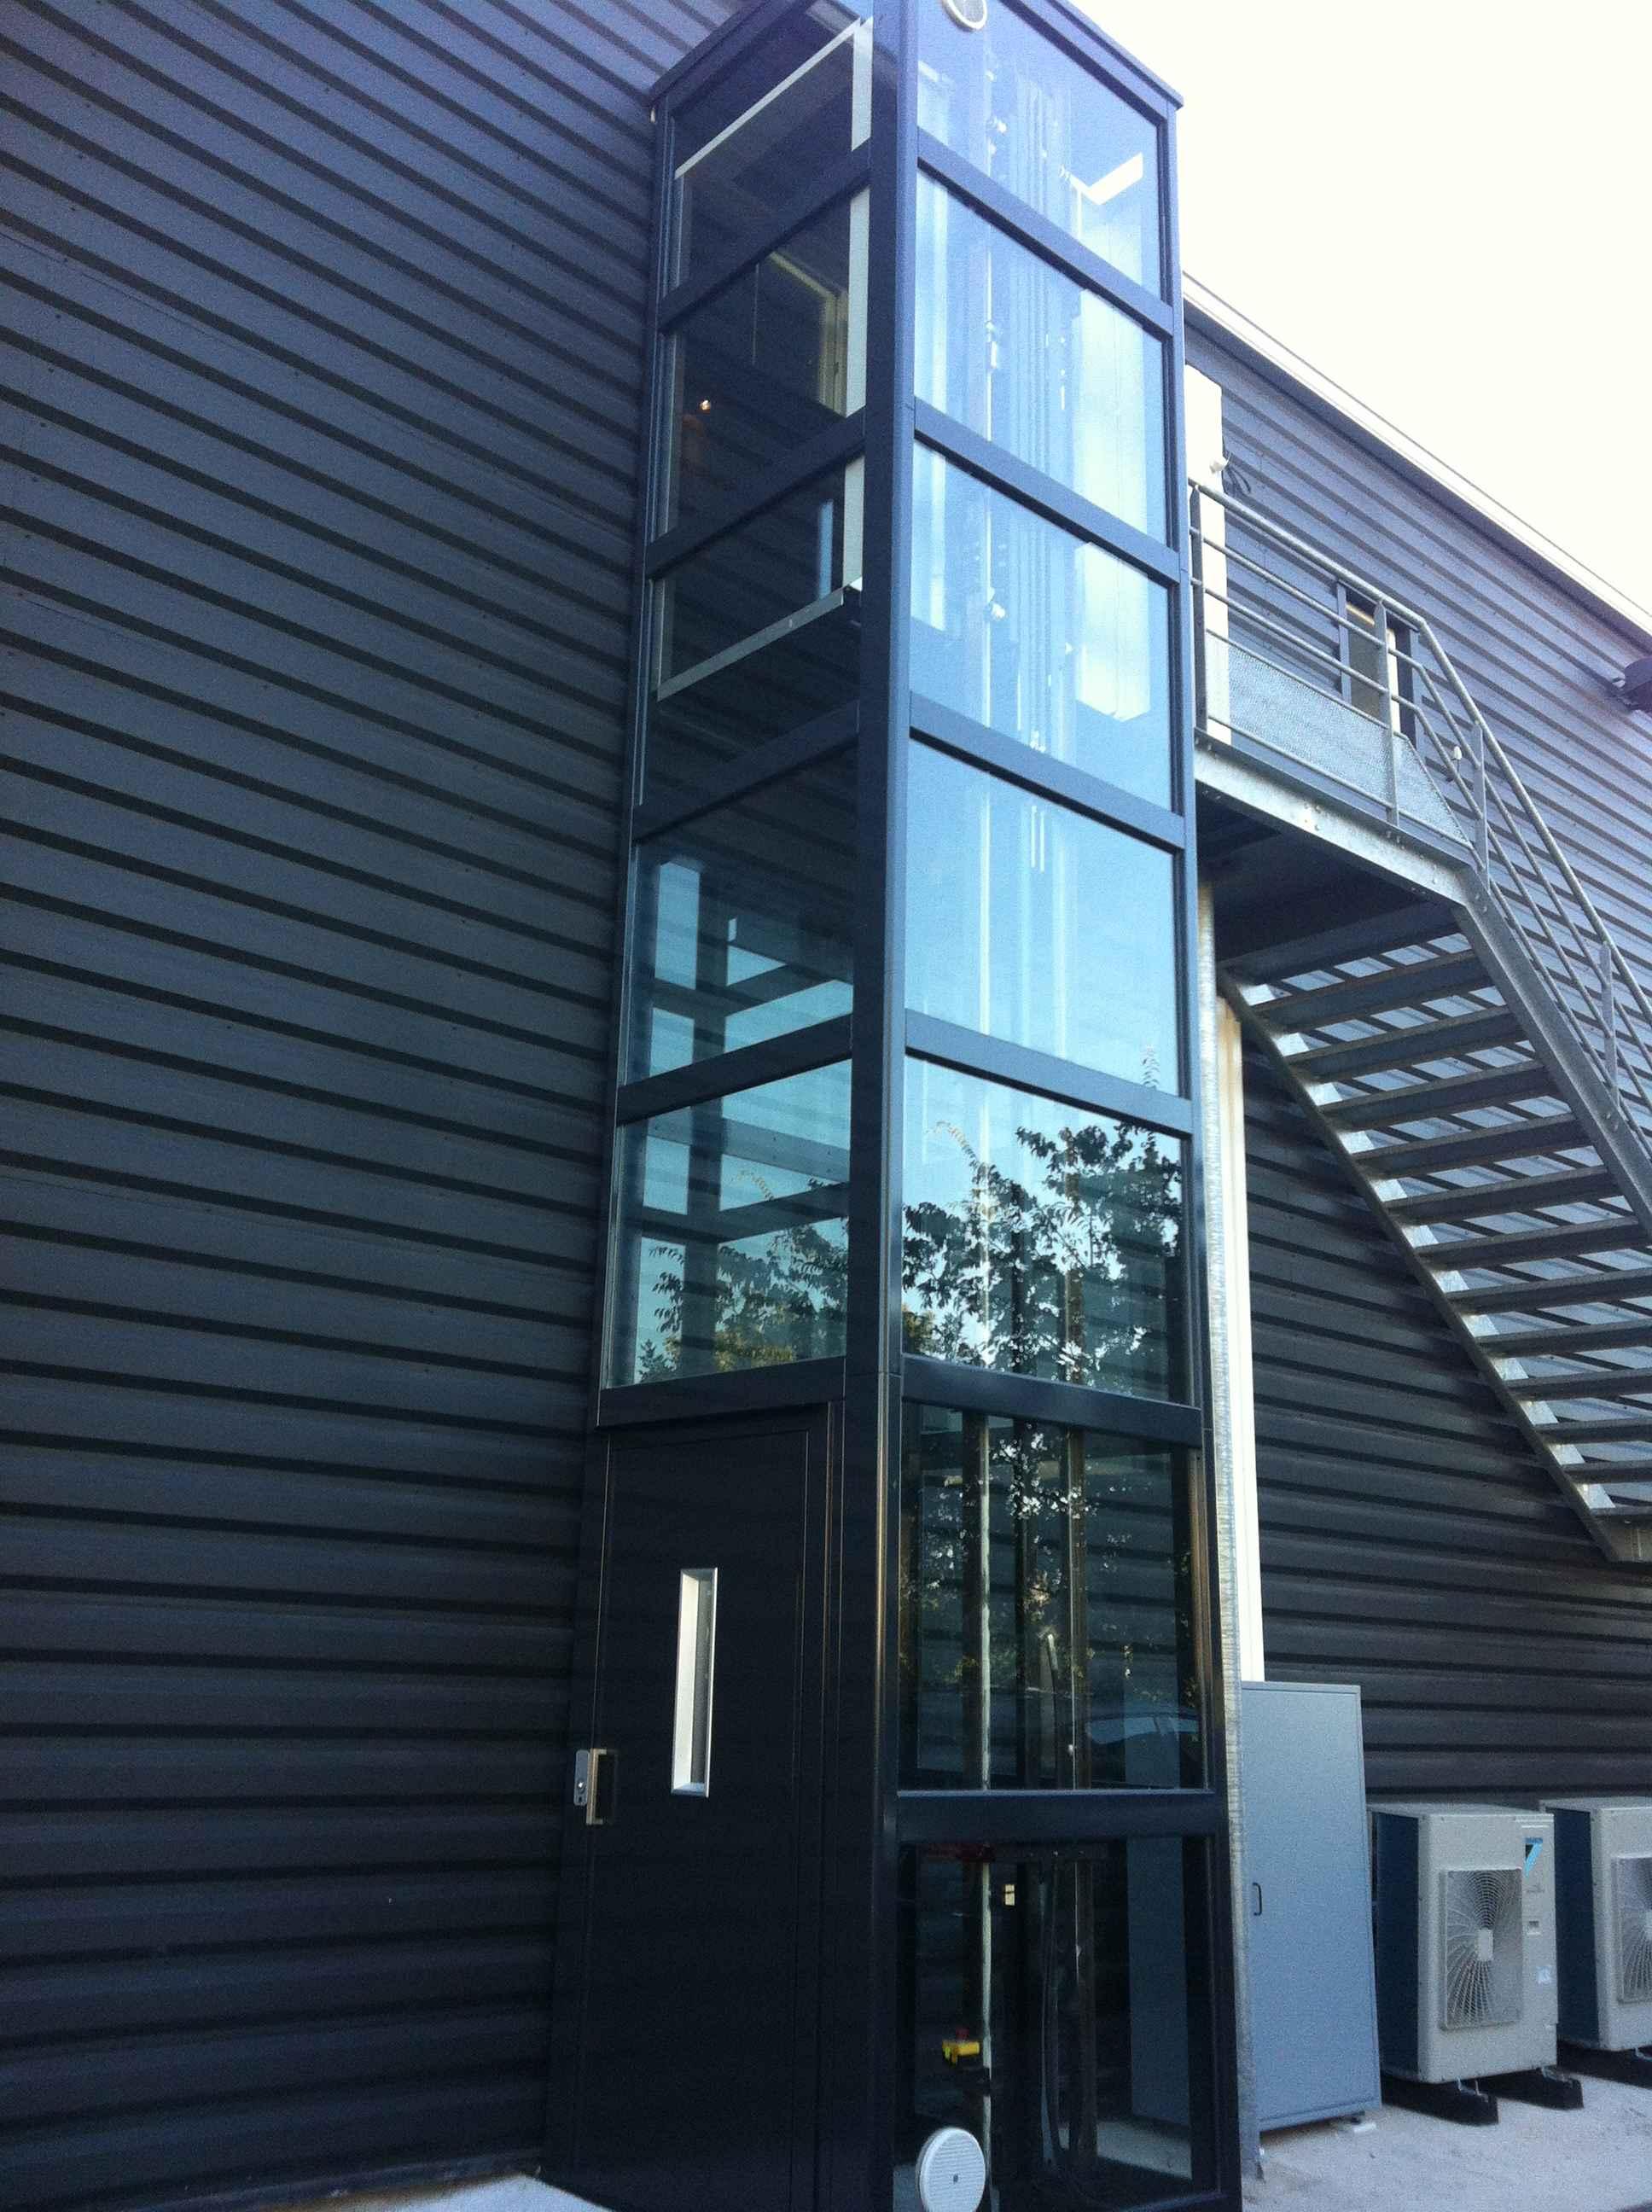 ascervi mini ascenseur batiment industriel. Black Bedroom Furniture Sets. Home Design Ideas